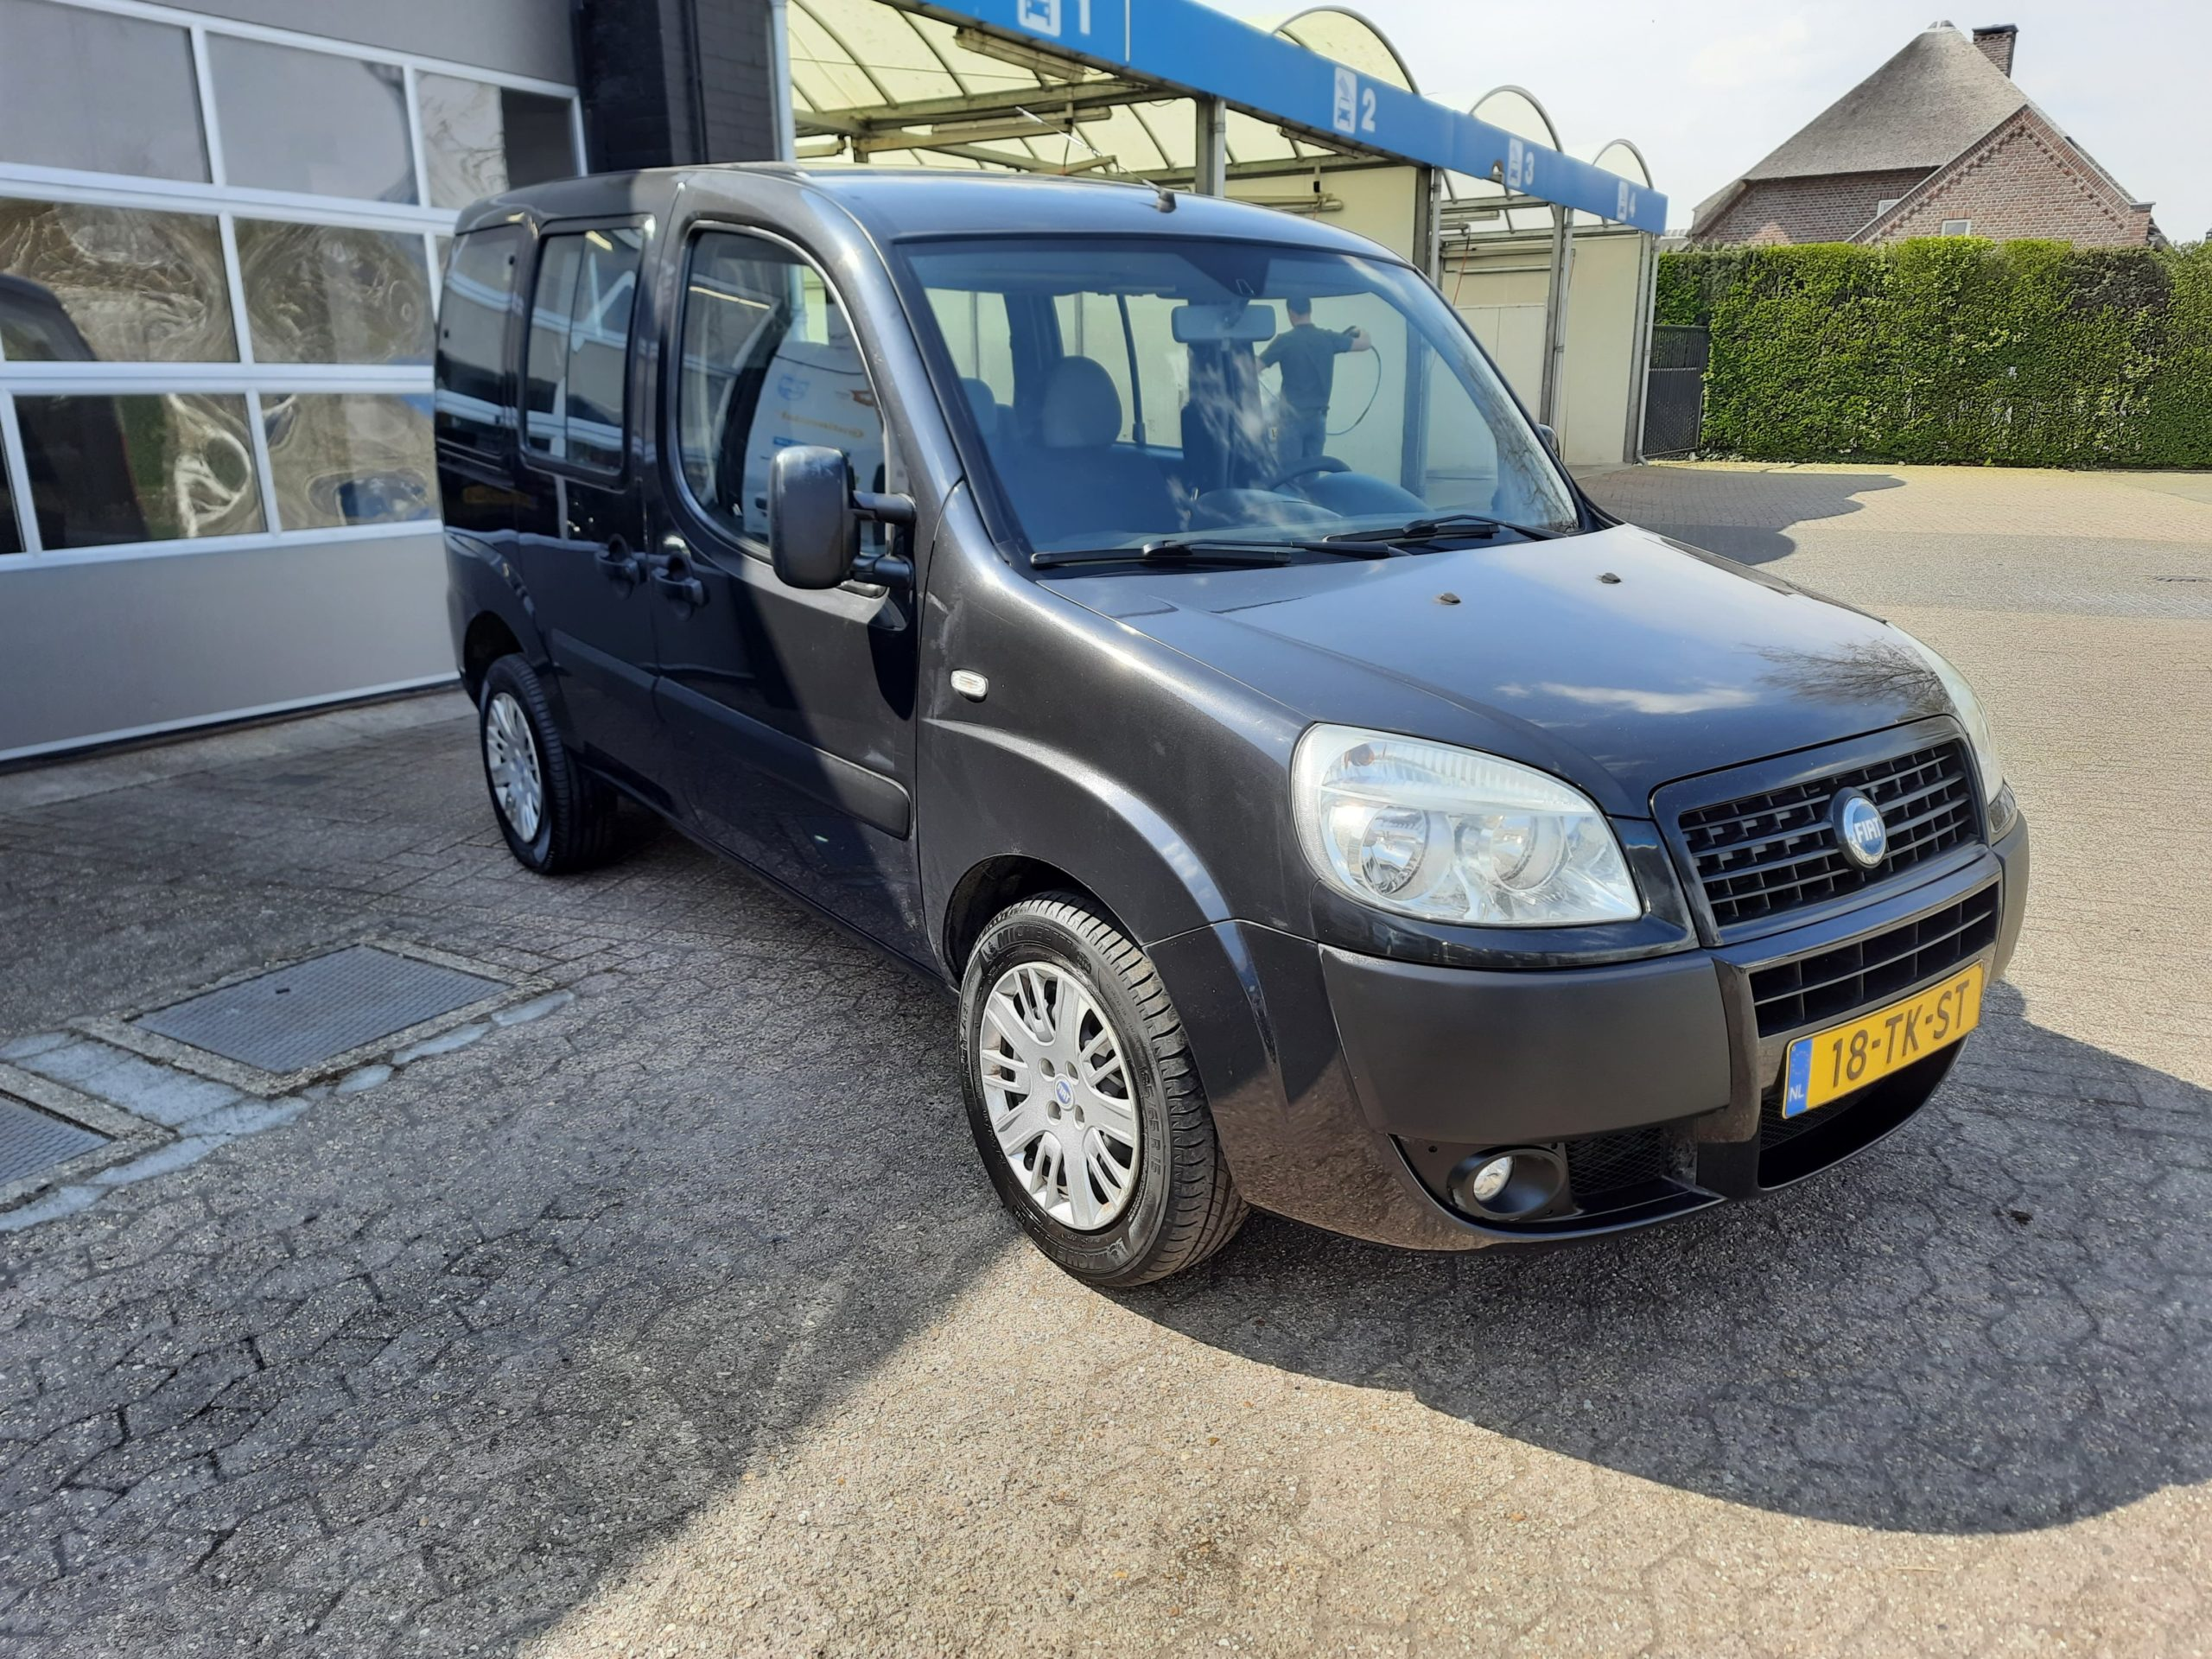 Fiat Doblo 1.4 airco (VERKOCHT)